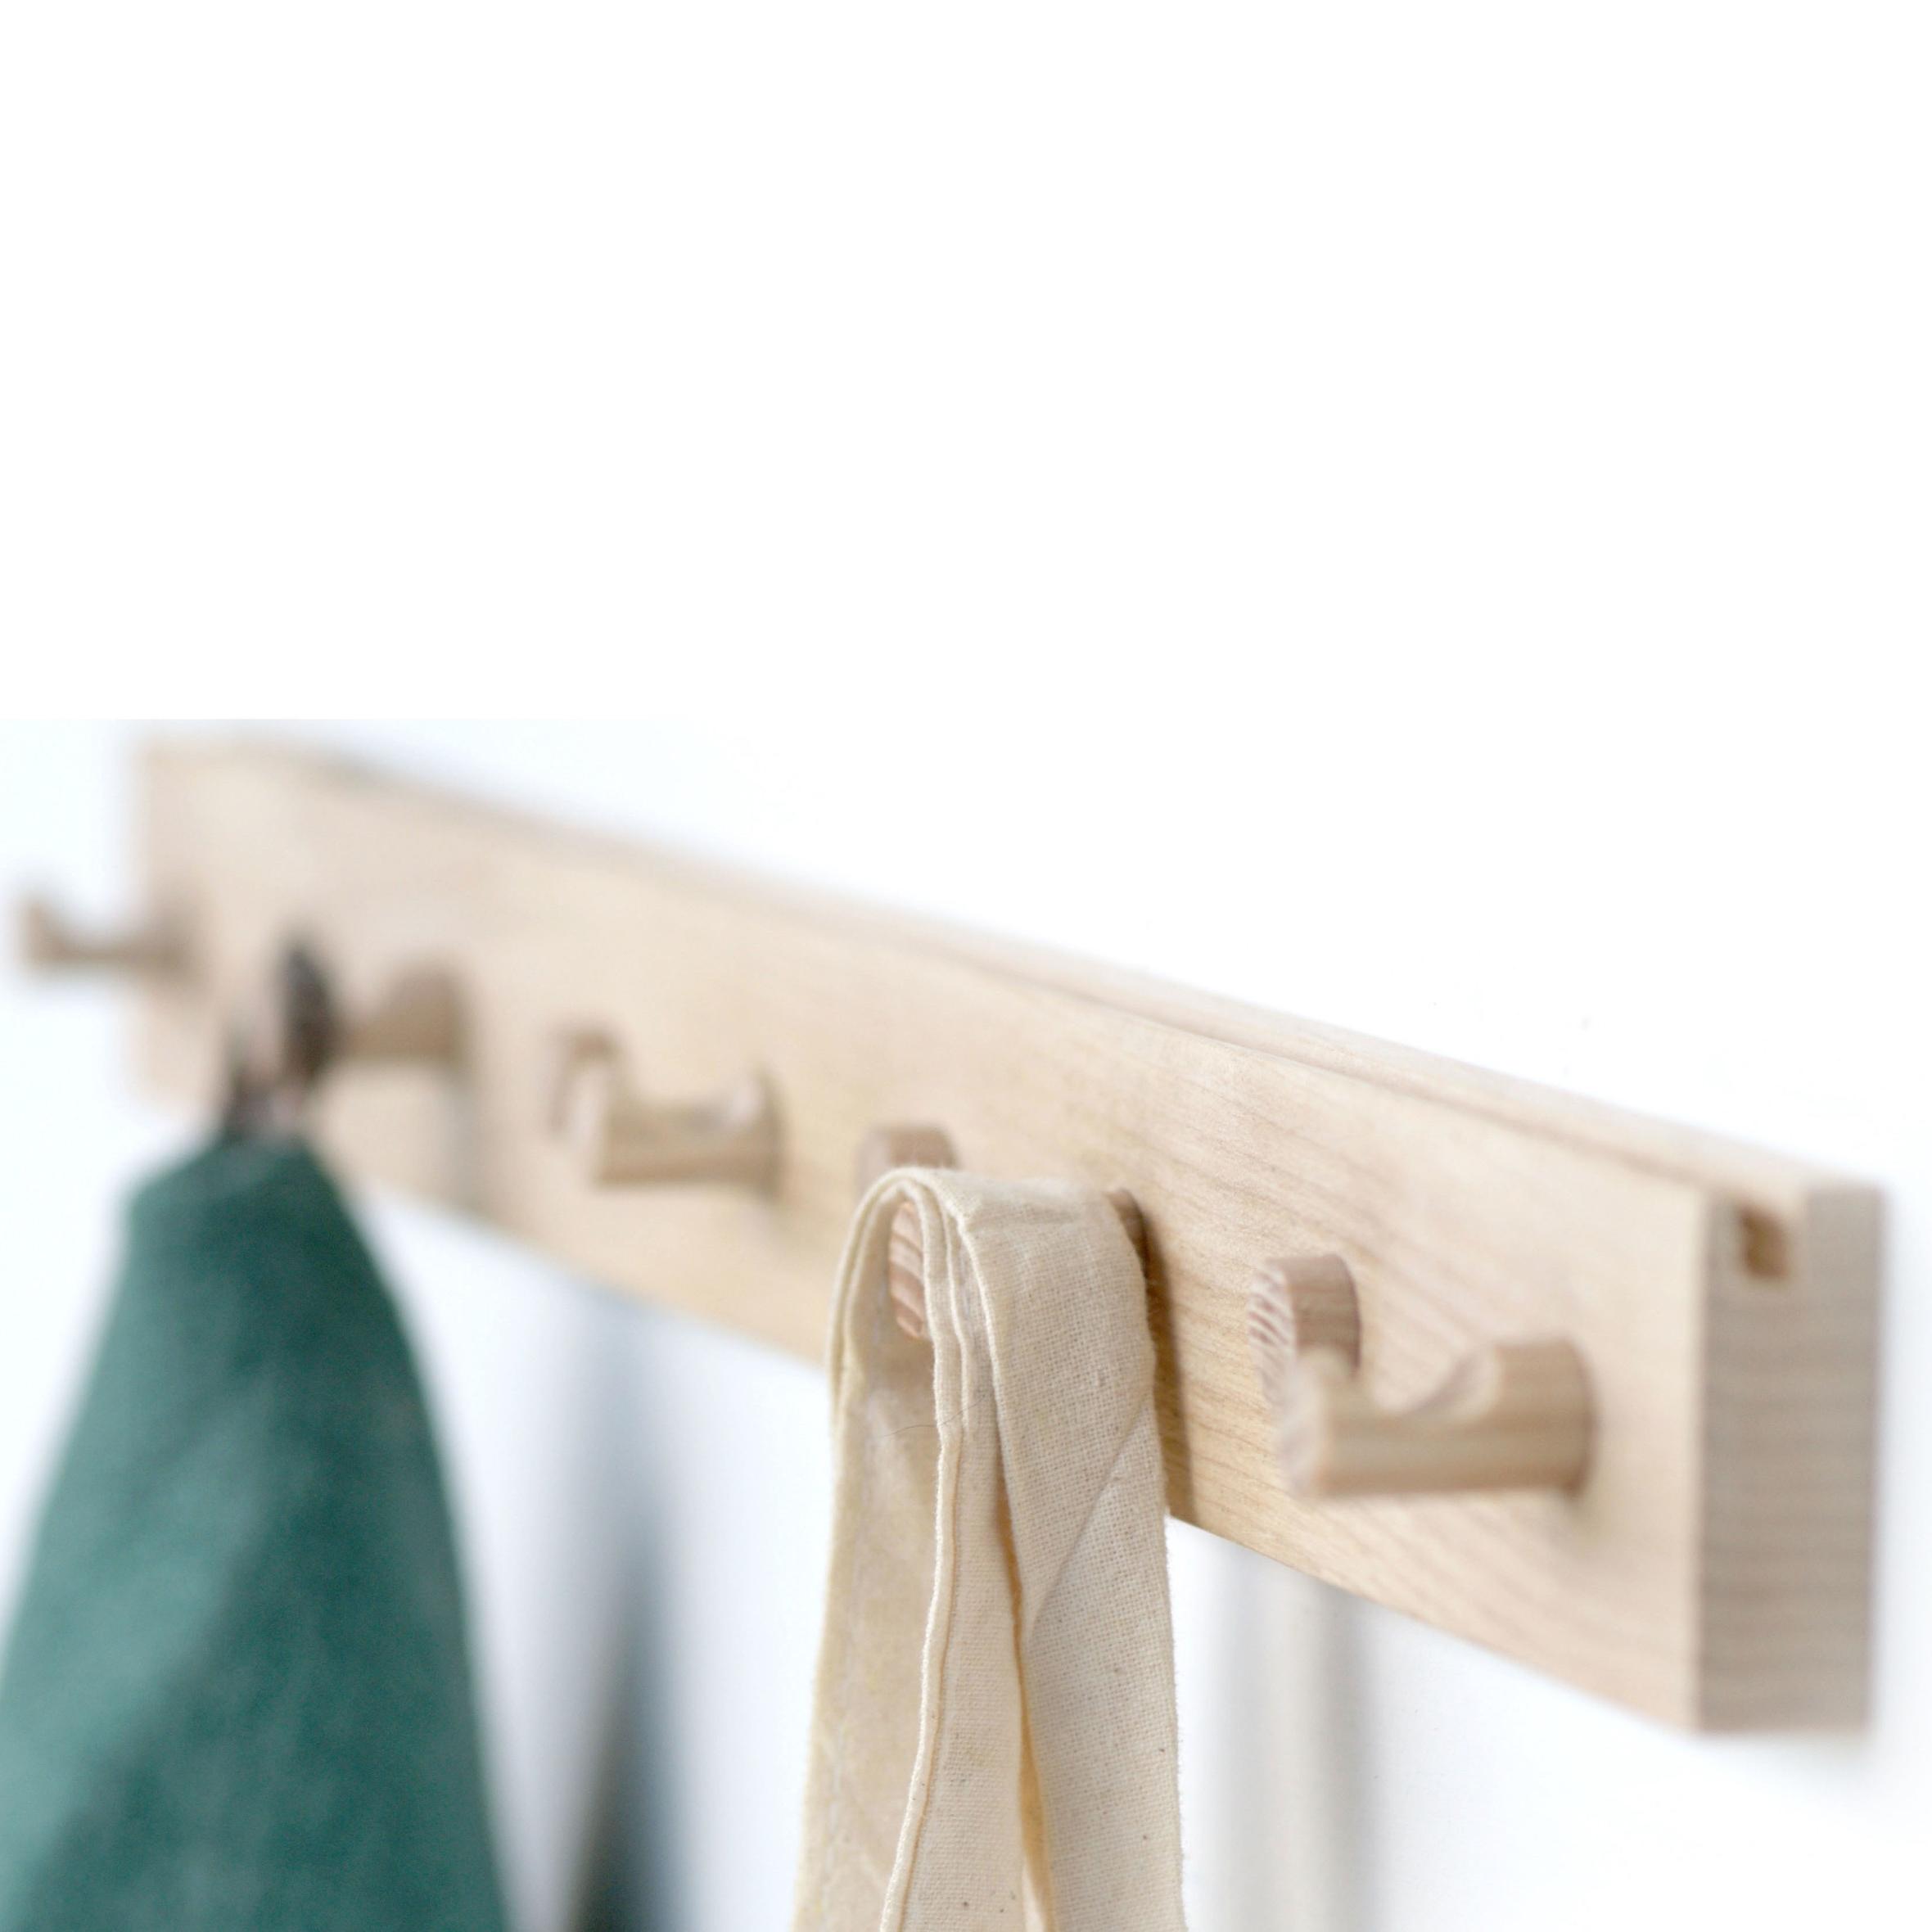 coat-hook-green.jpg